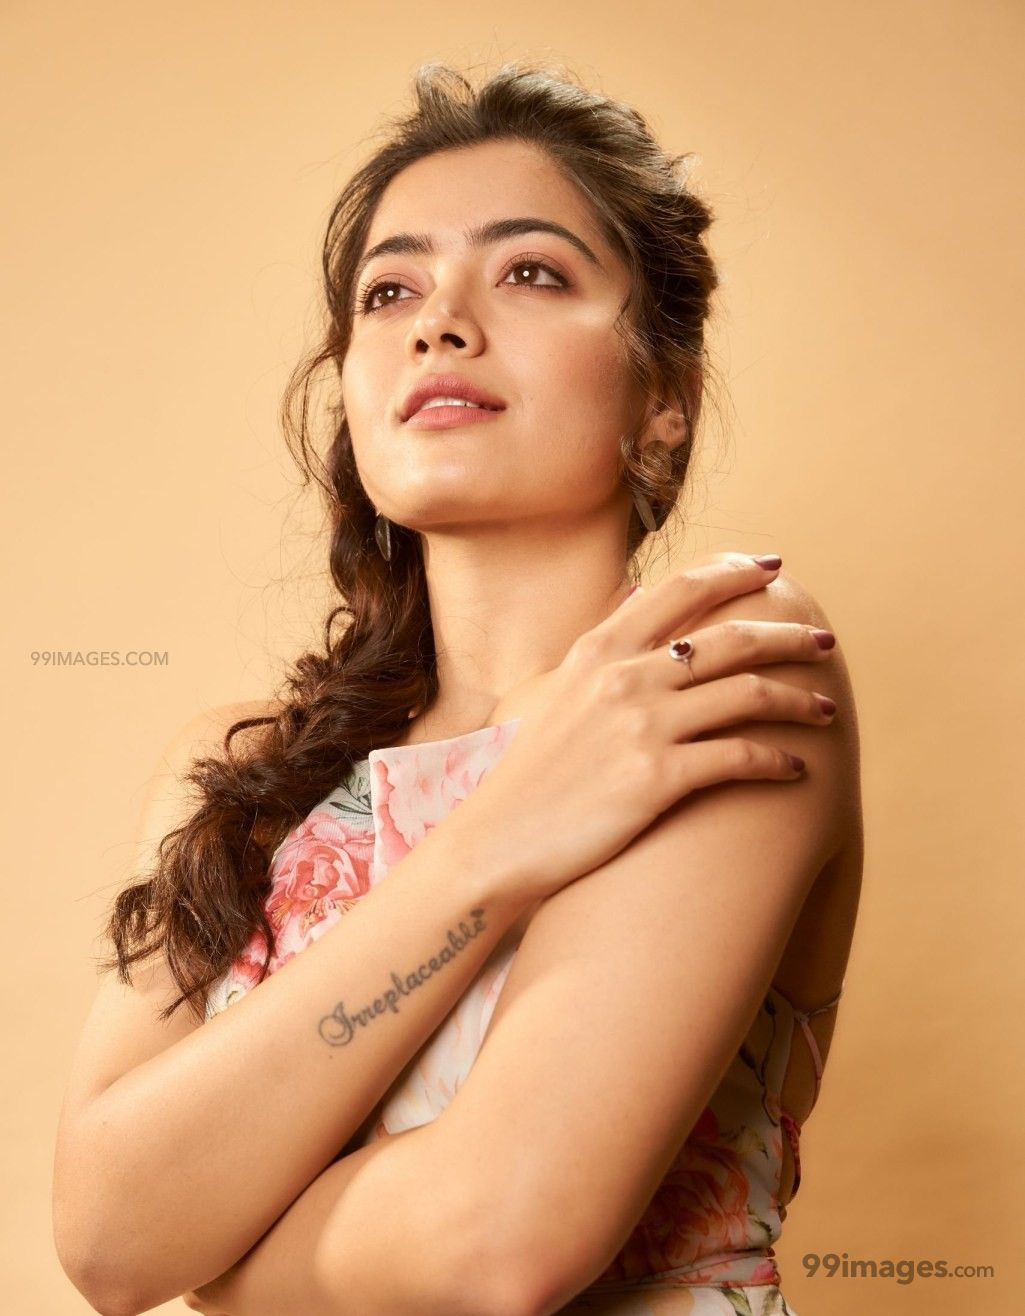 [75] Rashmika Mandanna Beautiful HD Photos Mobile Wallpapers 1025x1316